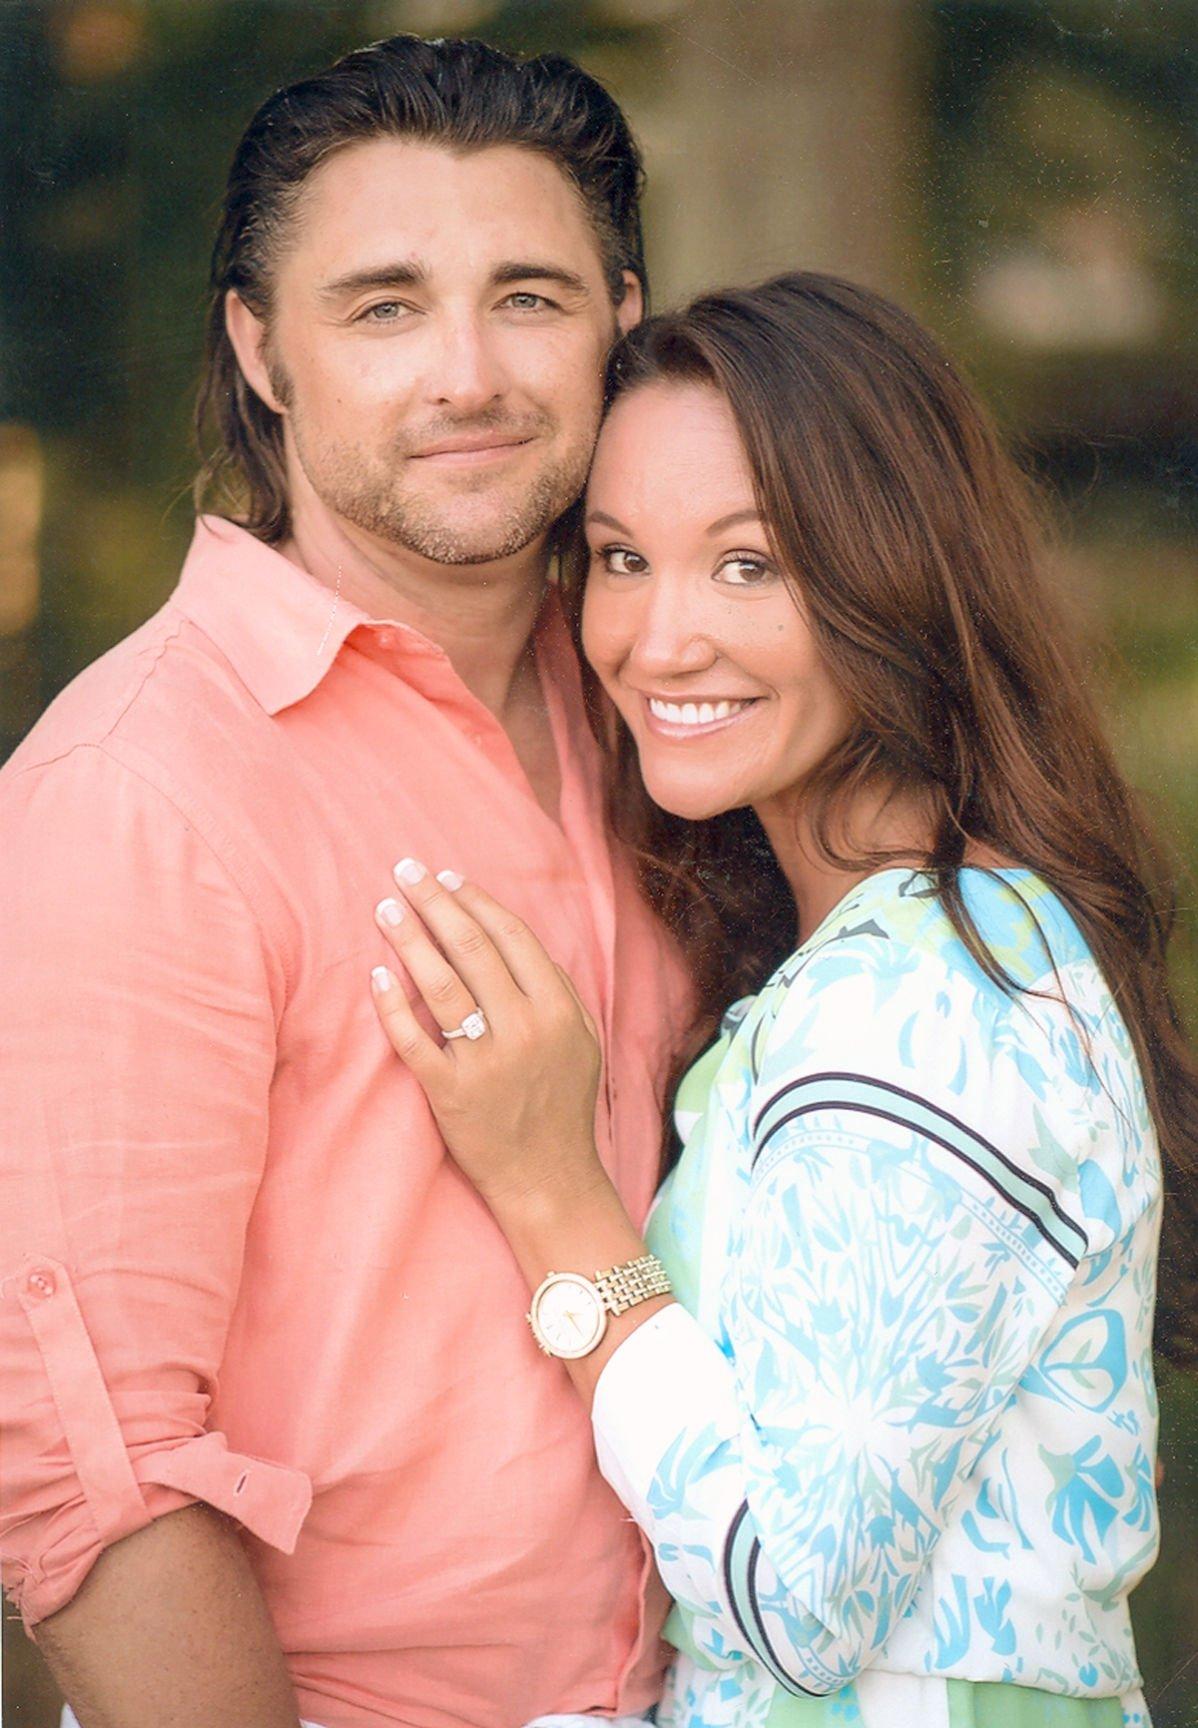 Joshua Cordle and Sara Gillianne